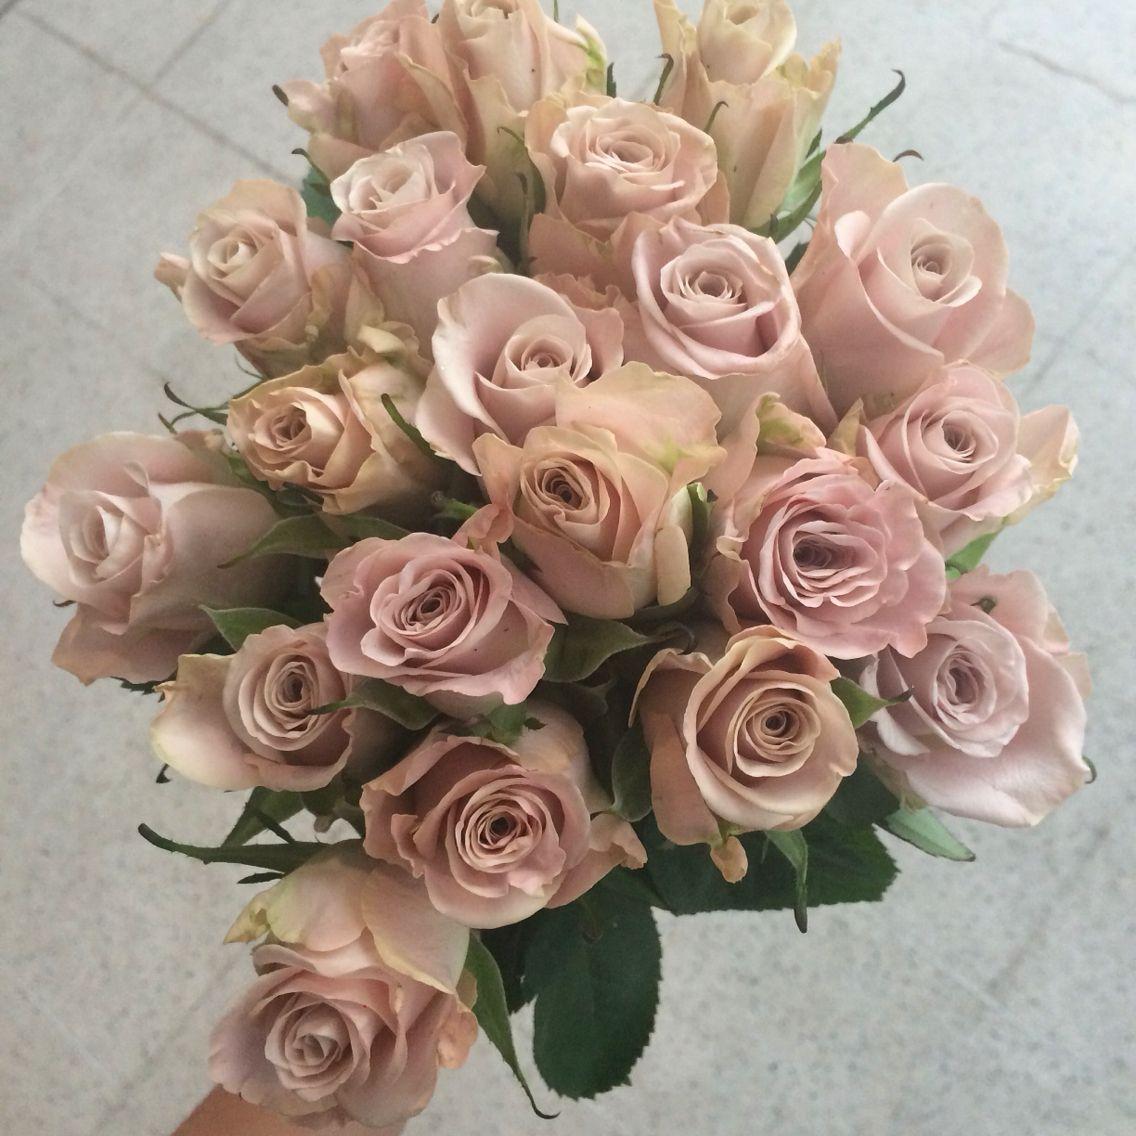 Cappuccino roses #roses #flowers #florist | Floral Arrangements ...